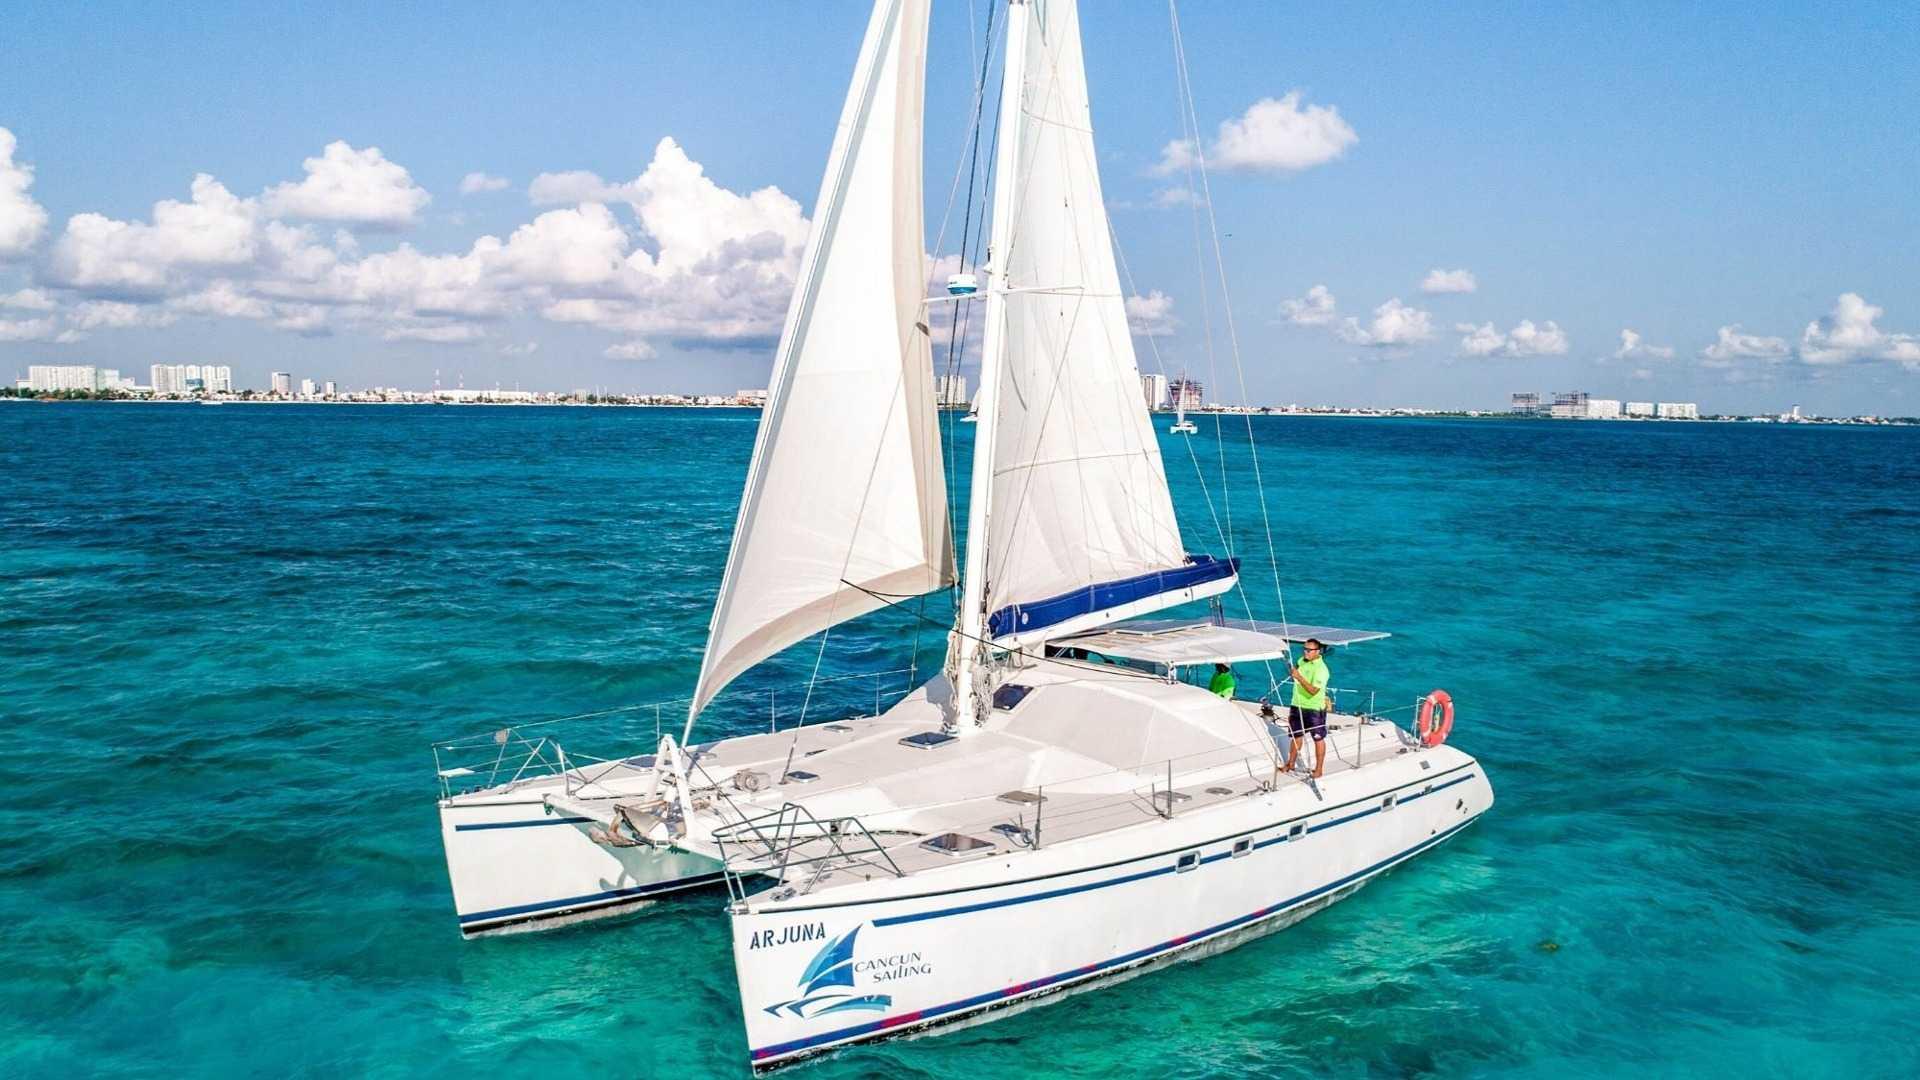 3 - LoRes - Arjuna - Isla Mujeres Catamaran Tour - Cancun Sailing